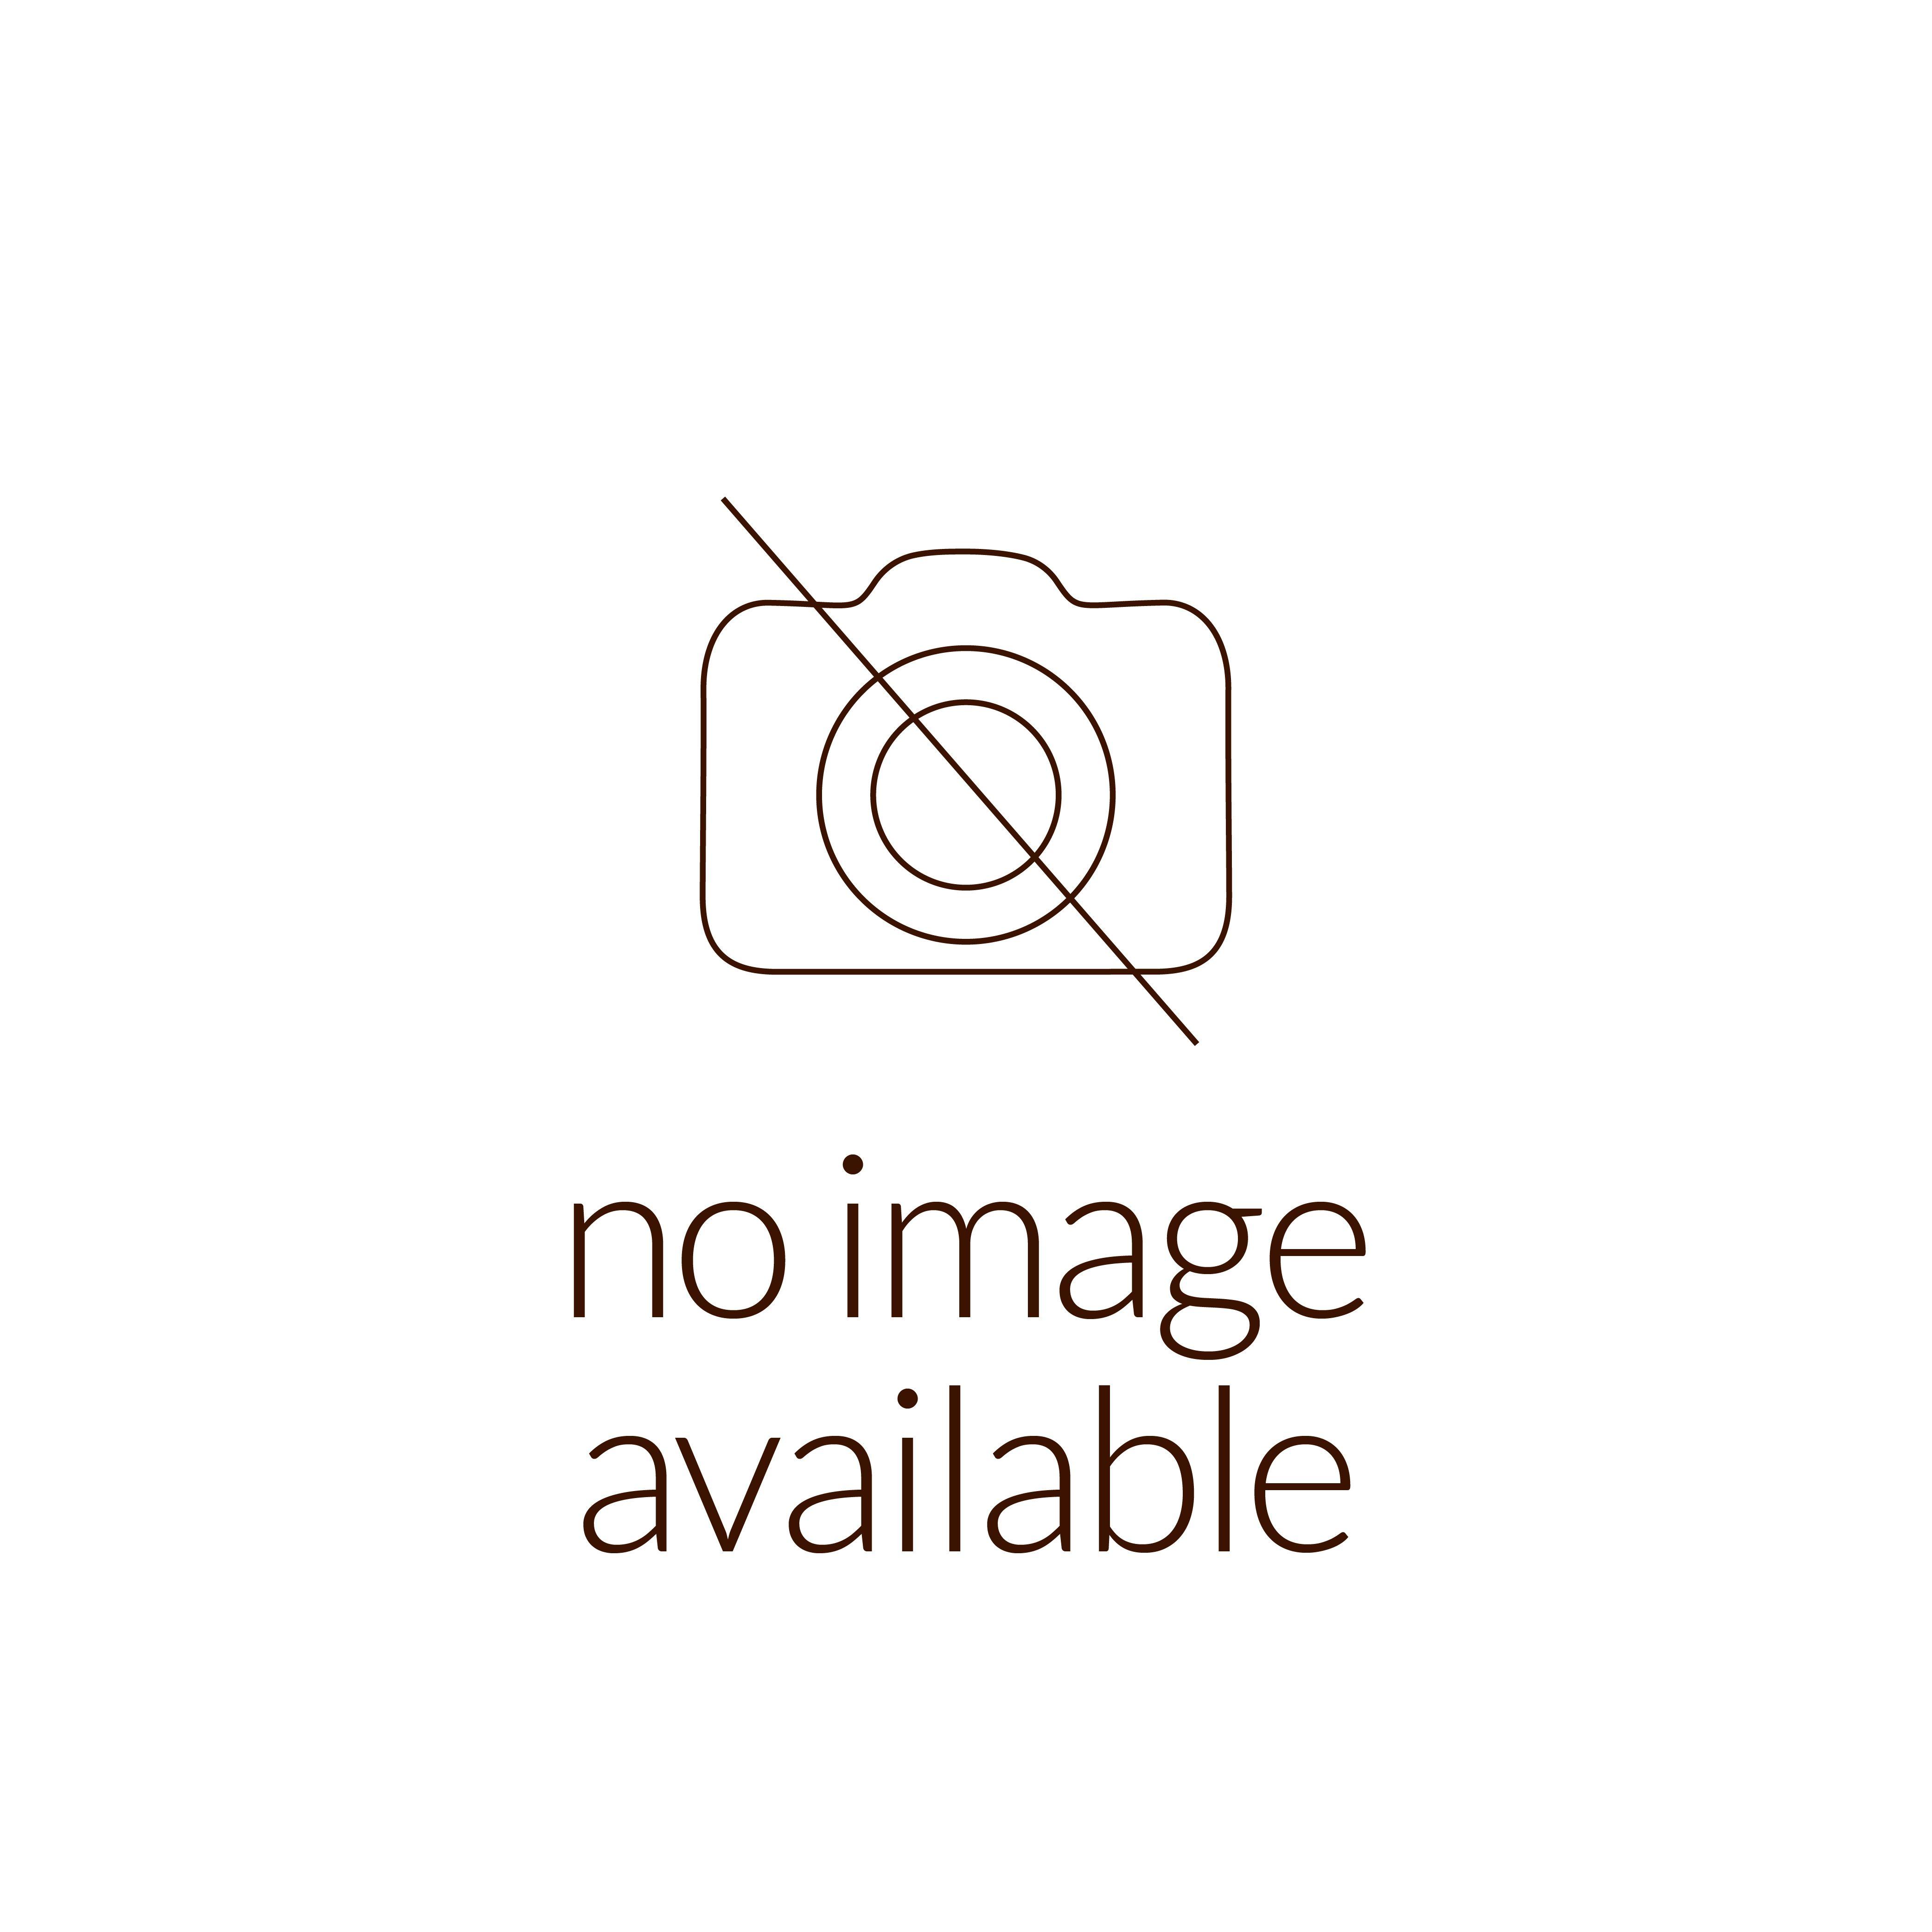 Invalids Olympics - 59.0 mm, 100 g, Bronze Tombac